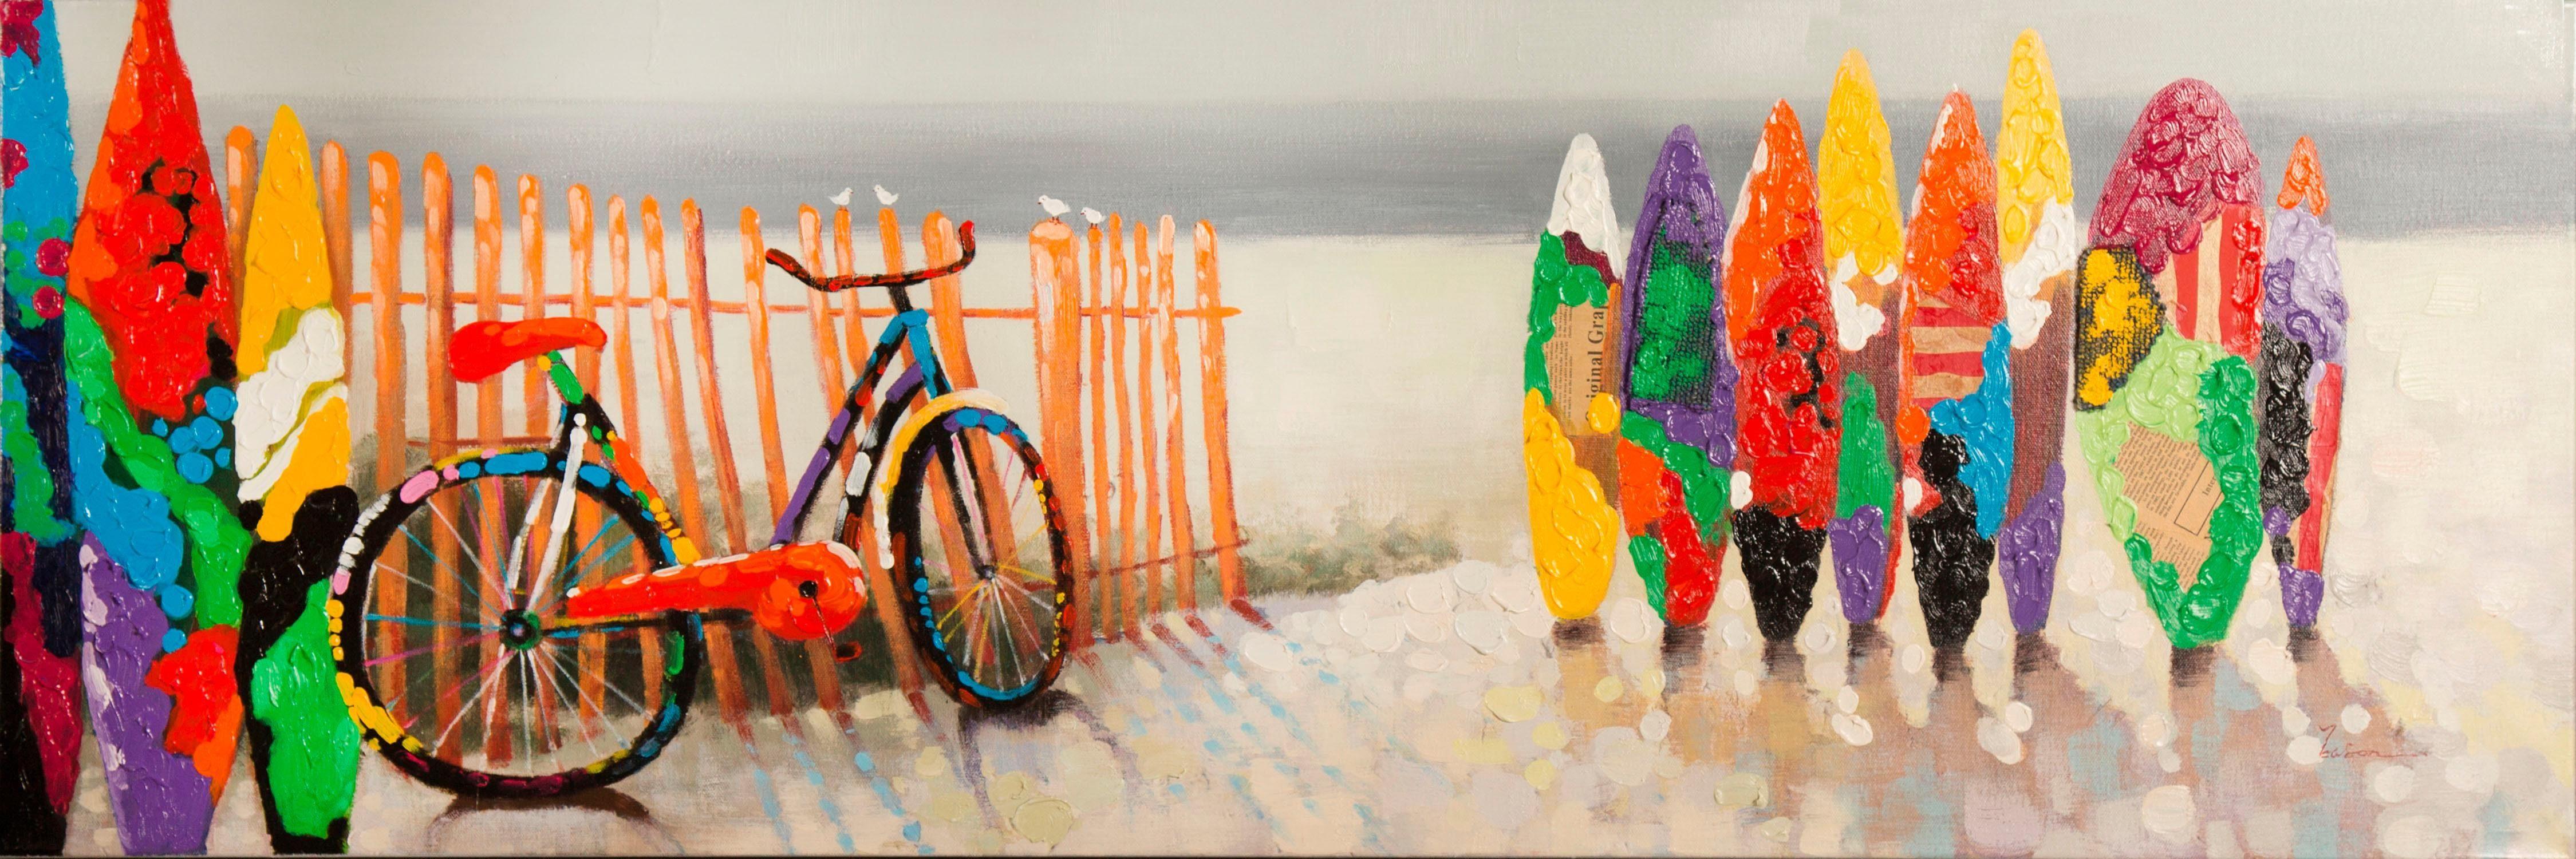 Ölgemälde »Bunte Surfbretter«, 150/50 cm, handgemalt